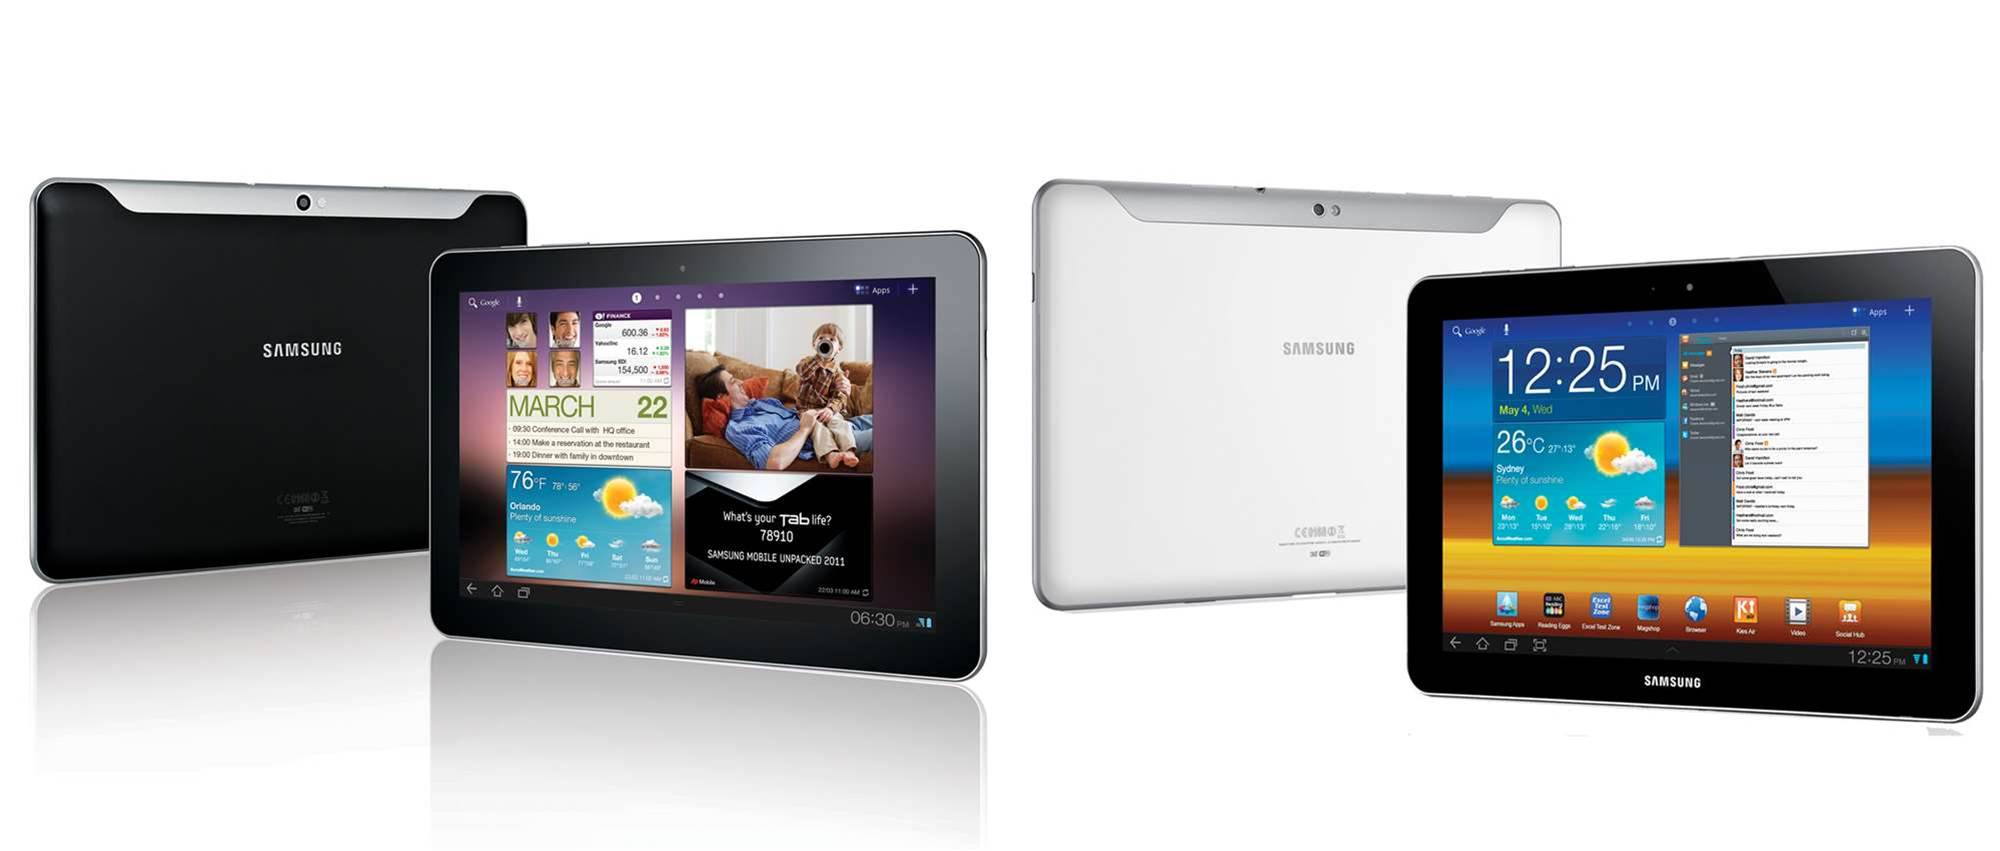 US court revives Apple claim on Samsung tablets